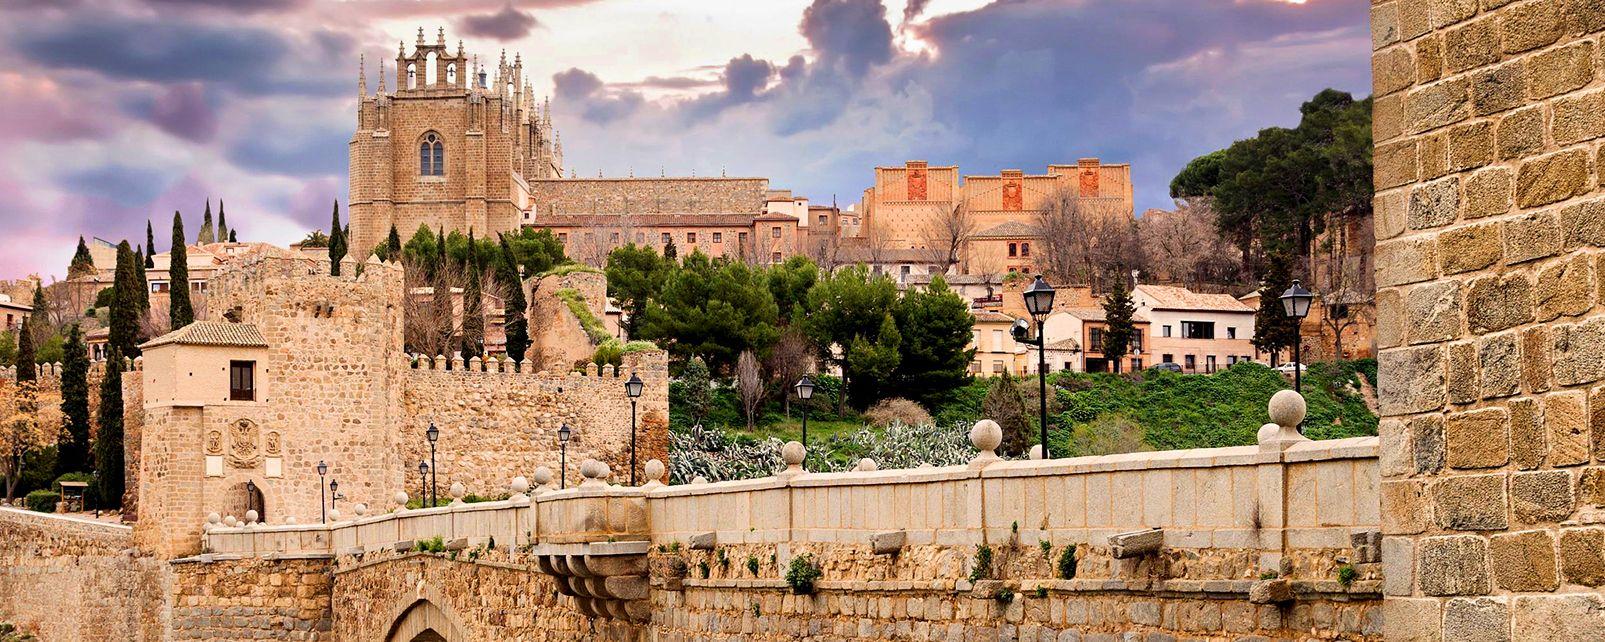 Kloster San Juan de los Reyes , Spanien